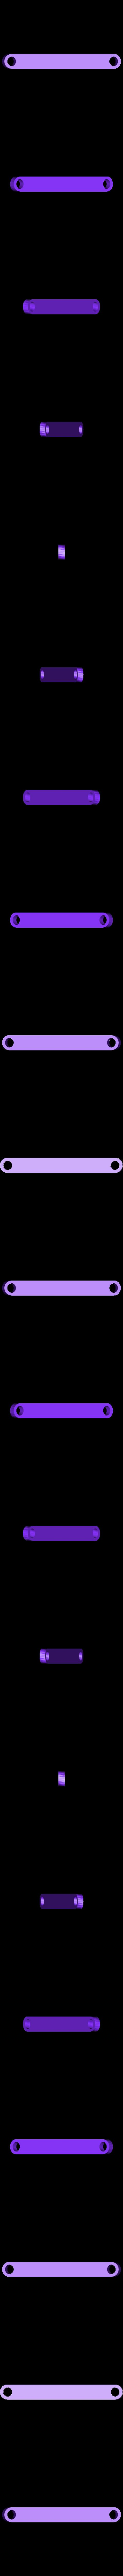 Arm_Lower.stl Download free STL file Fingerdigger • Design to 3D print, Zippityboomba